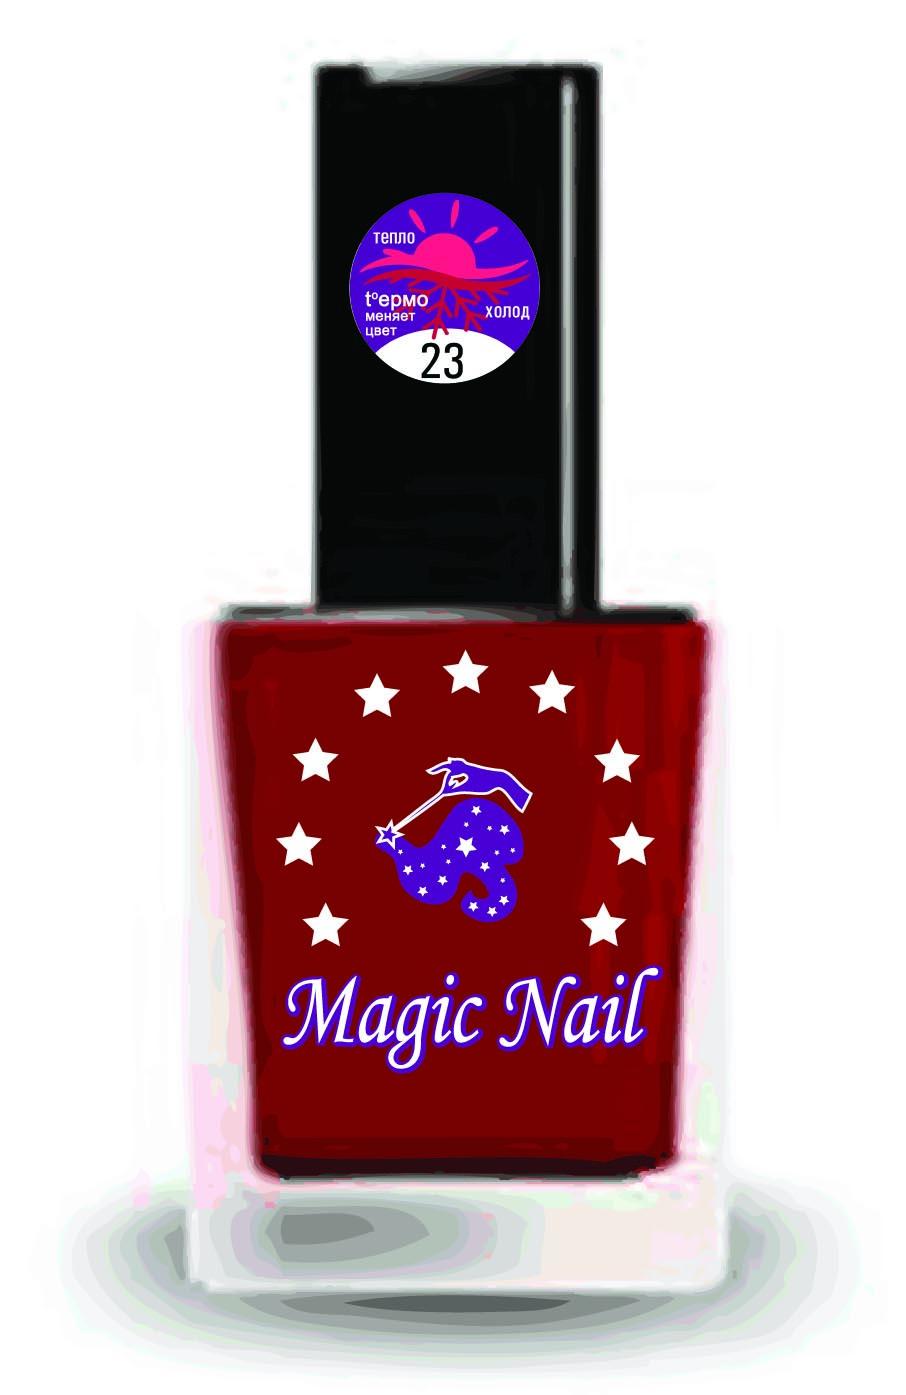 Дизайн этикетки лака для ногтей и логотип! фото f_7165a10c4bf88475.jpg